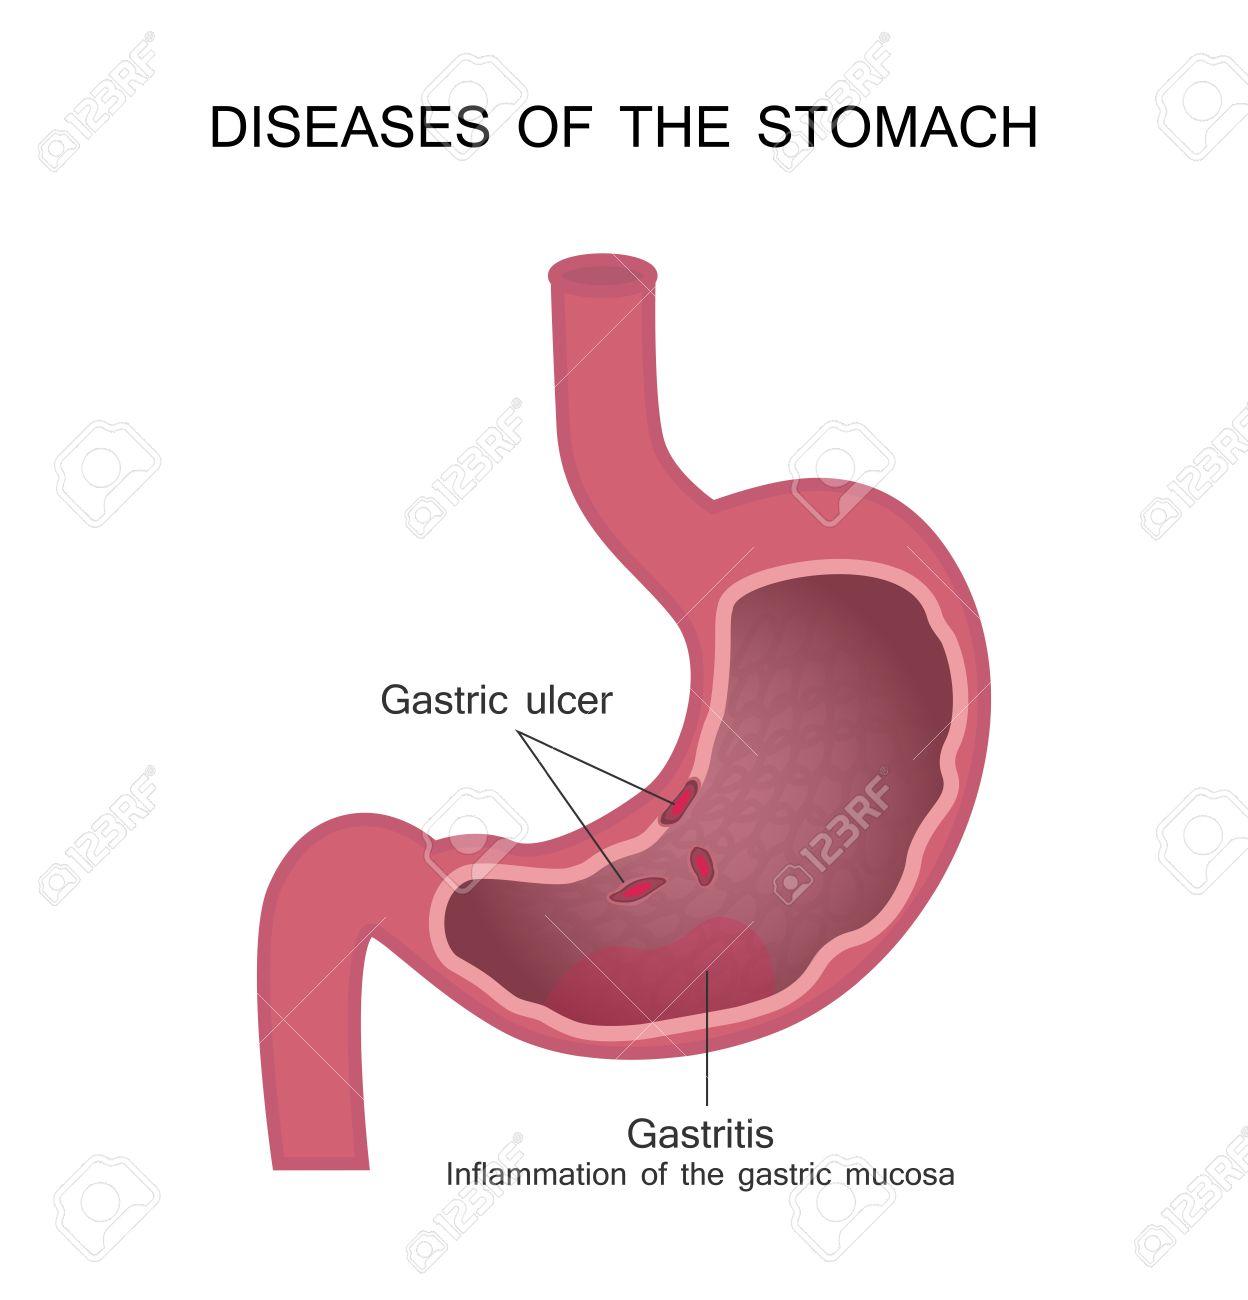 gastritis y ulcera peptica diagnostico